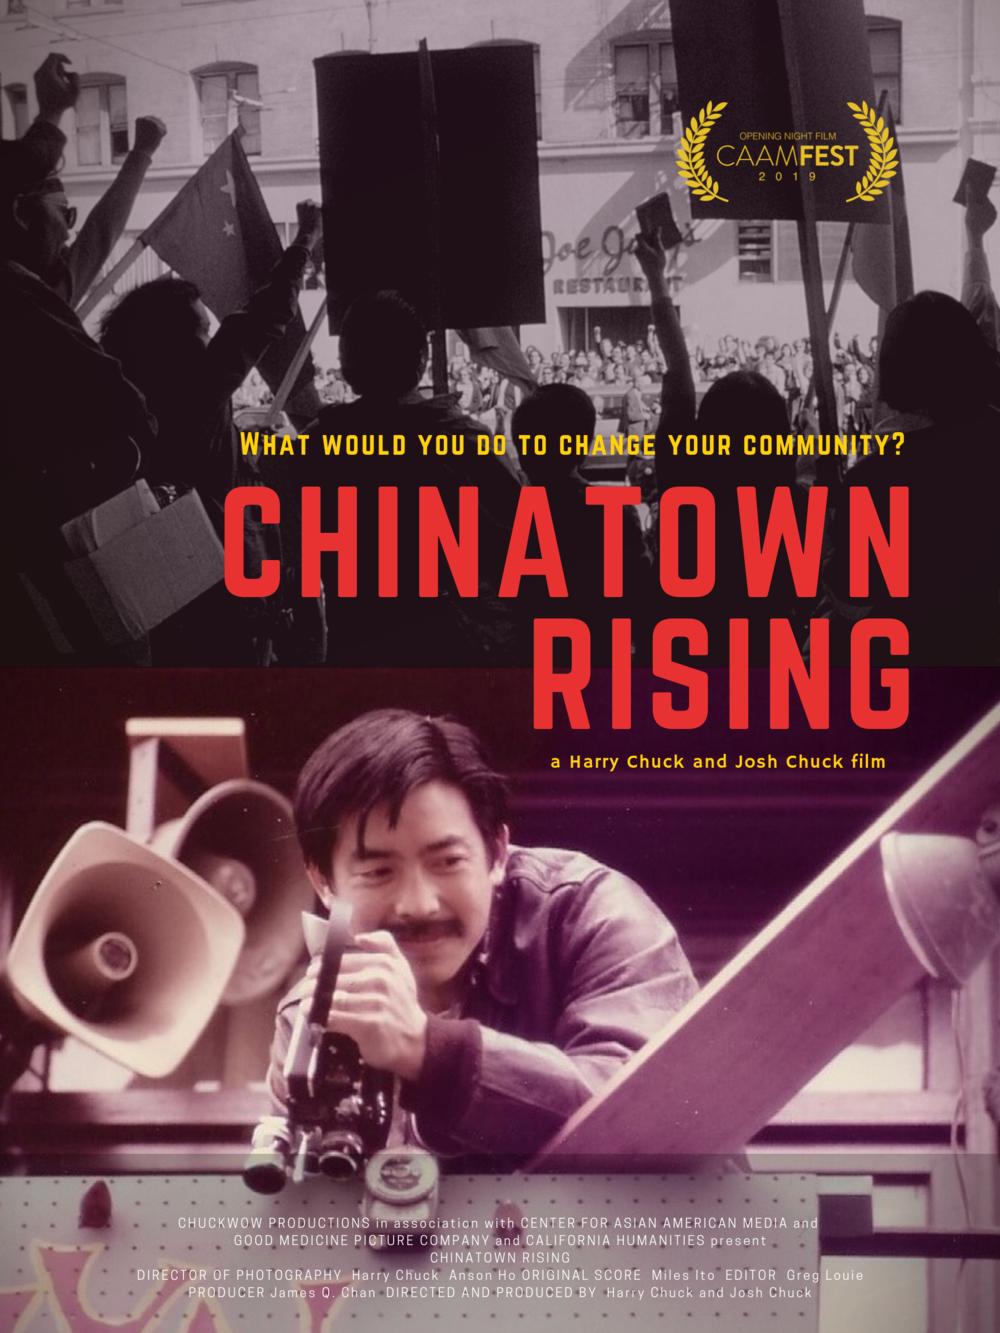 ChinatownRisingPoster3_v_Final_2.png